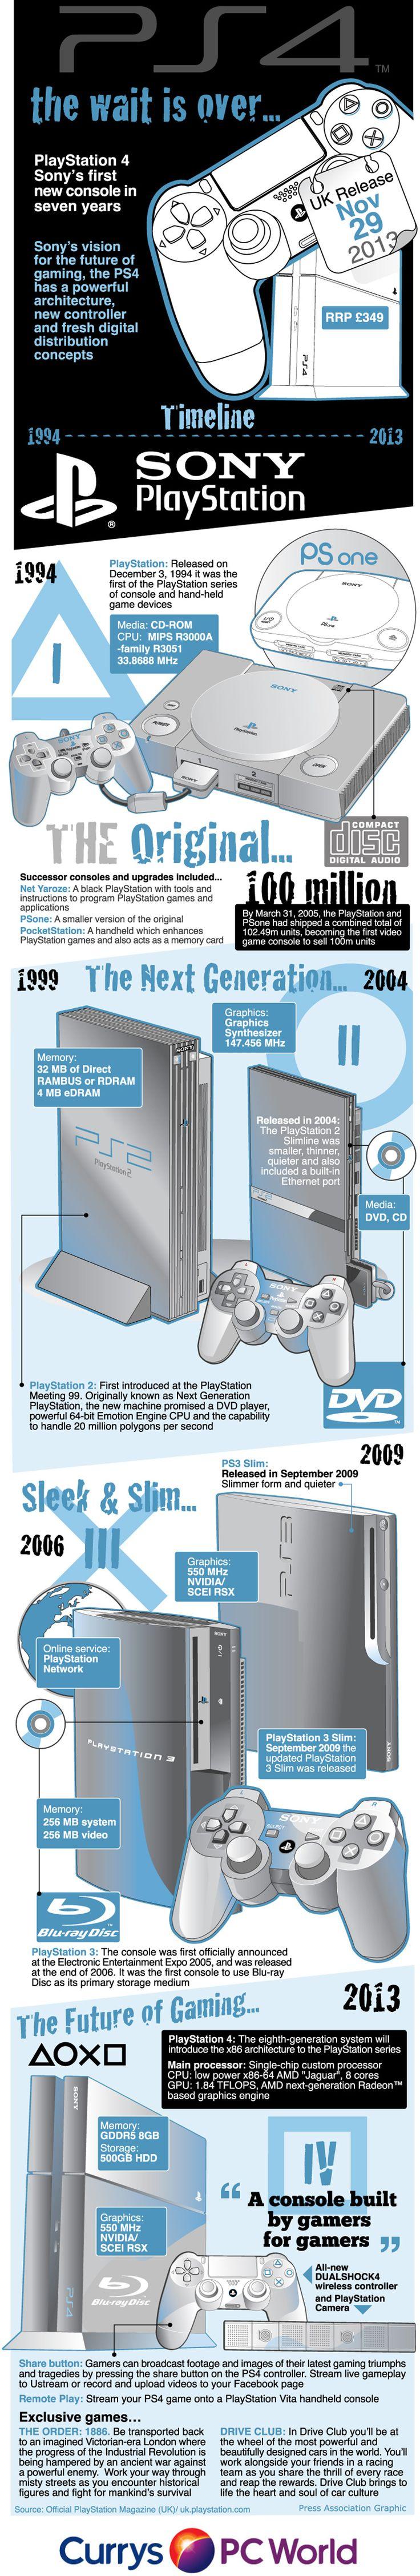 7 Best Sprzt Images On Pinterest Music Speakers Loudspeaker And Dali Jaket Motor Pria Rc660 Infographic The Evolution Of Playstation